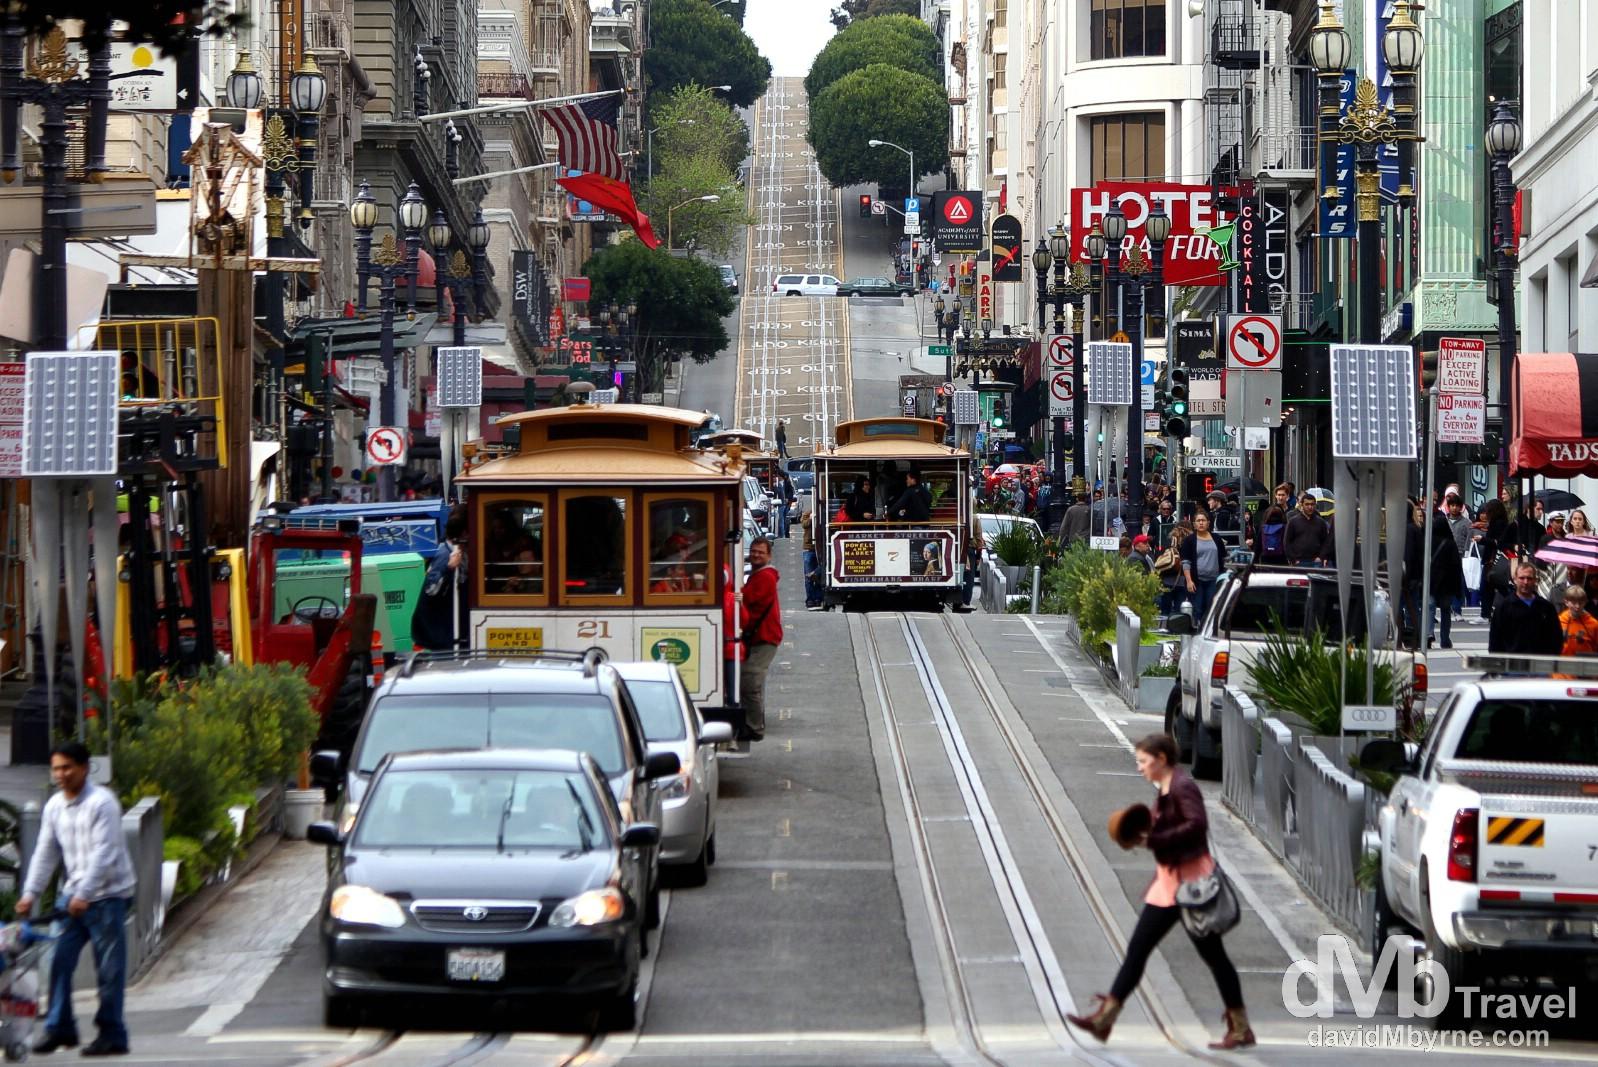 San francisco california usa worldwide destination photography